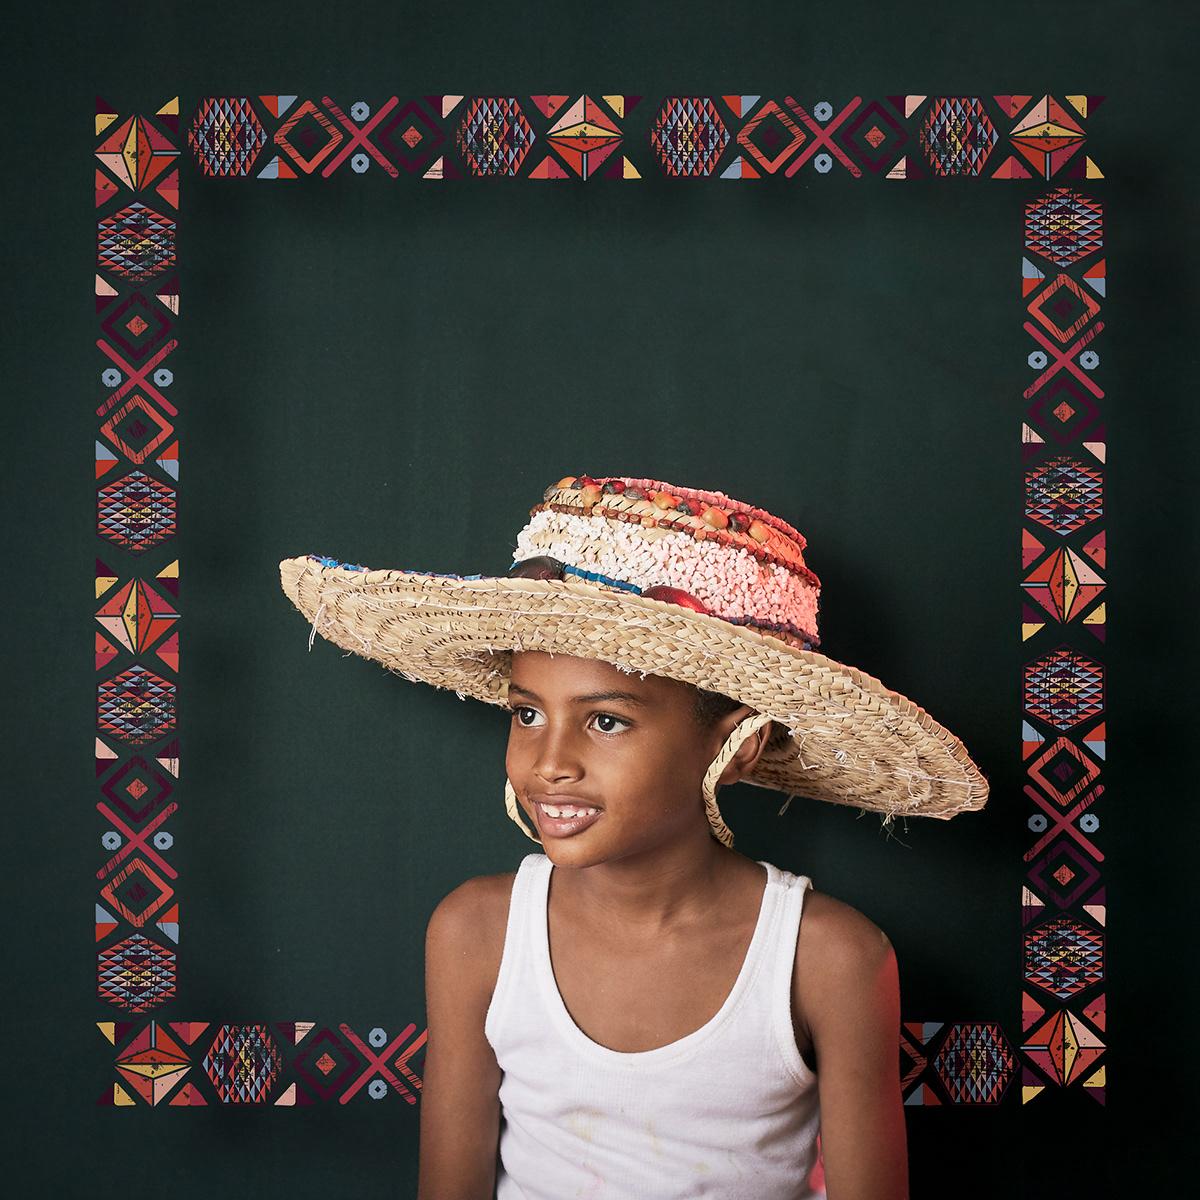 shela lamu kenya hat contest creative festival Community Project Documentary  Fashion